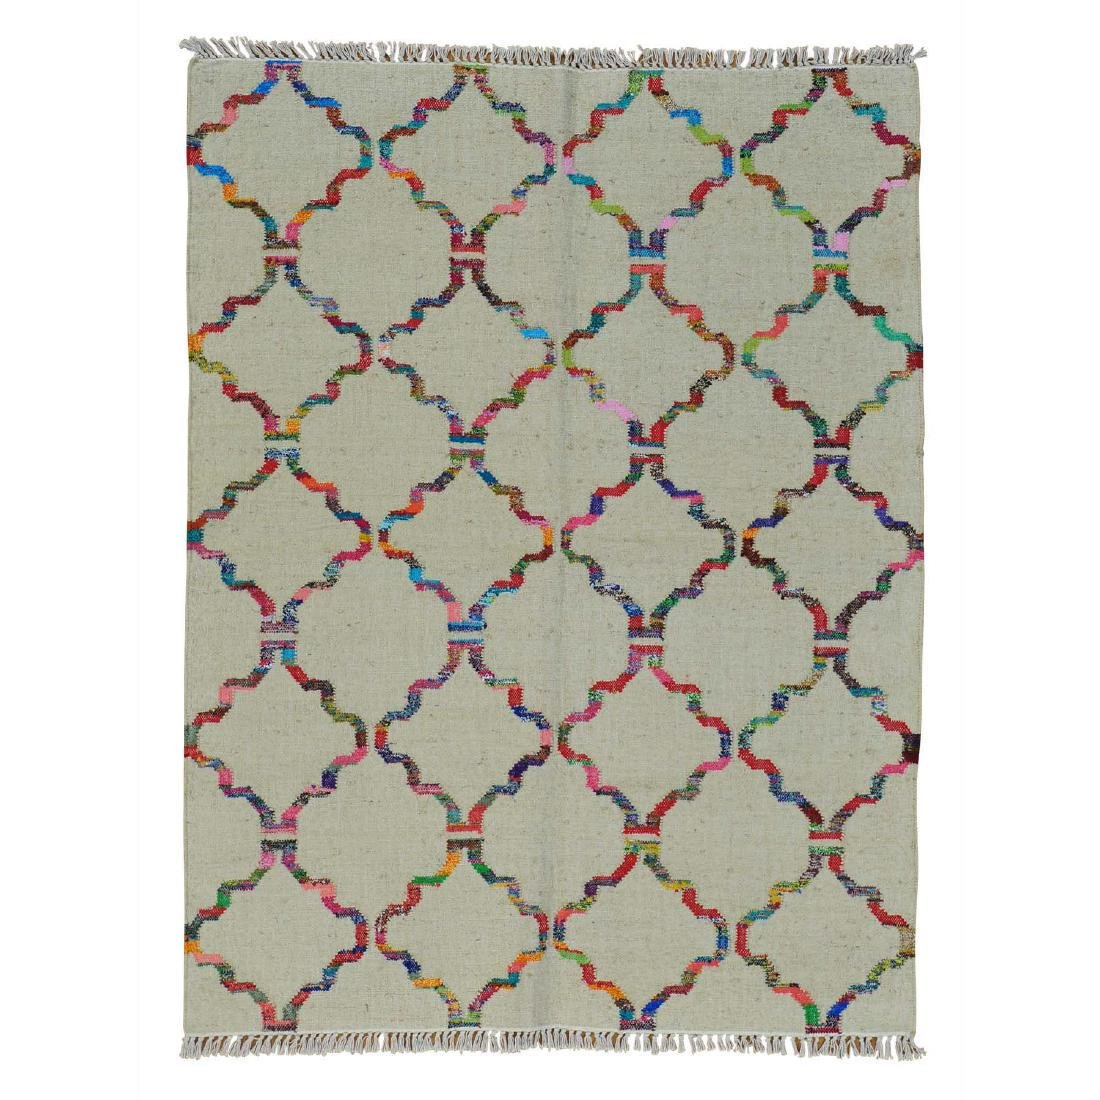 Durie Kilim Wool & Sari Silk Hand Woven Rug 5.2x7.1